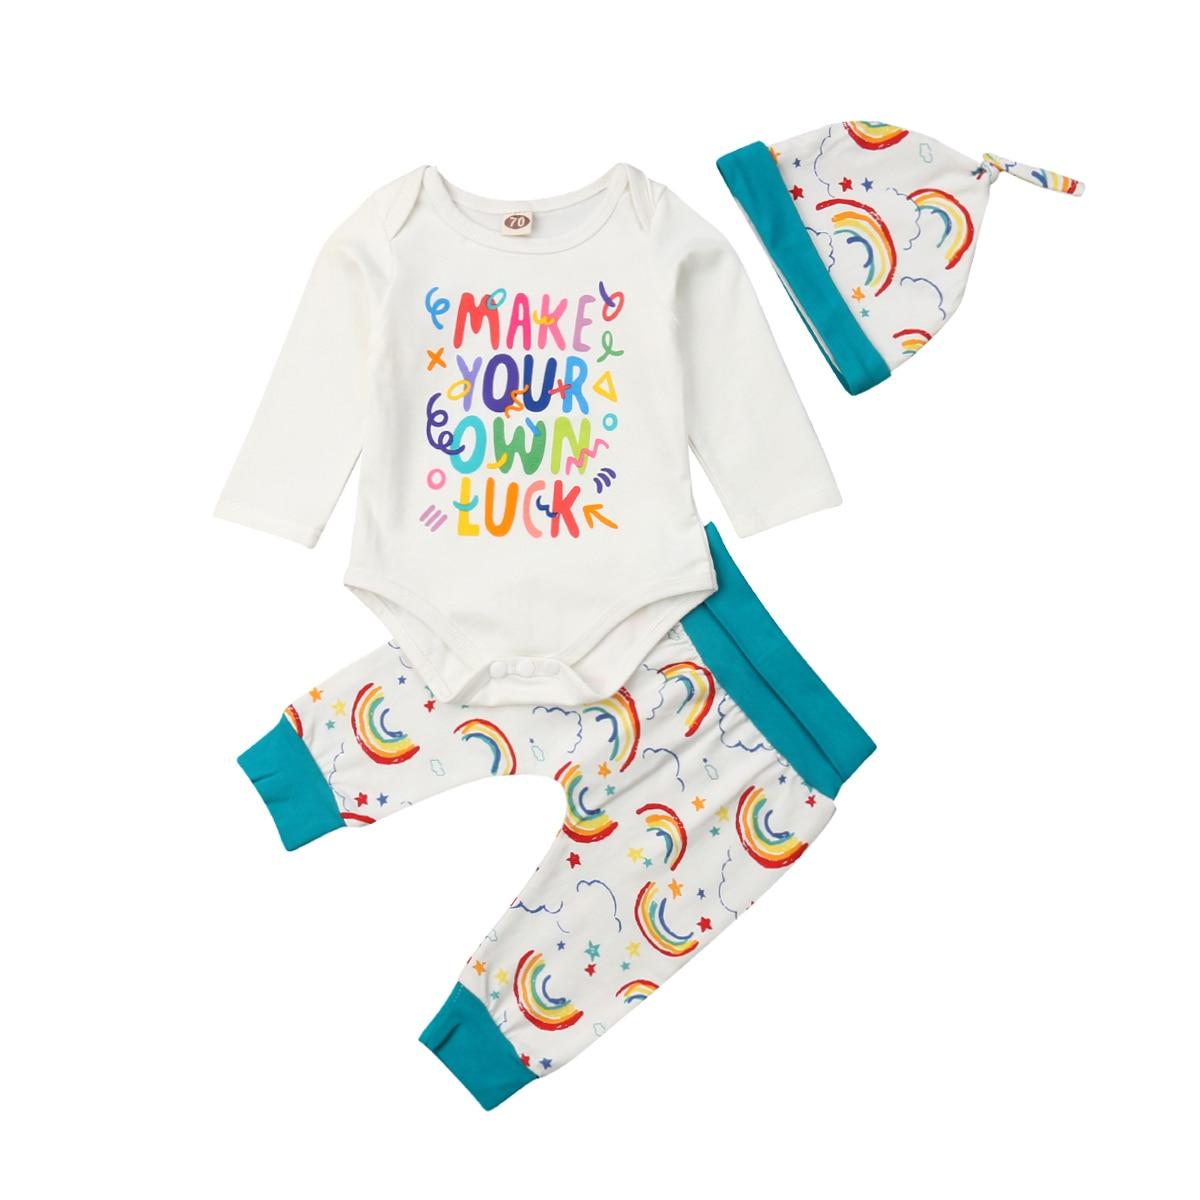 Toddler Newborn Baby Boy Girls Clothing Set Spring Infant ...